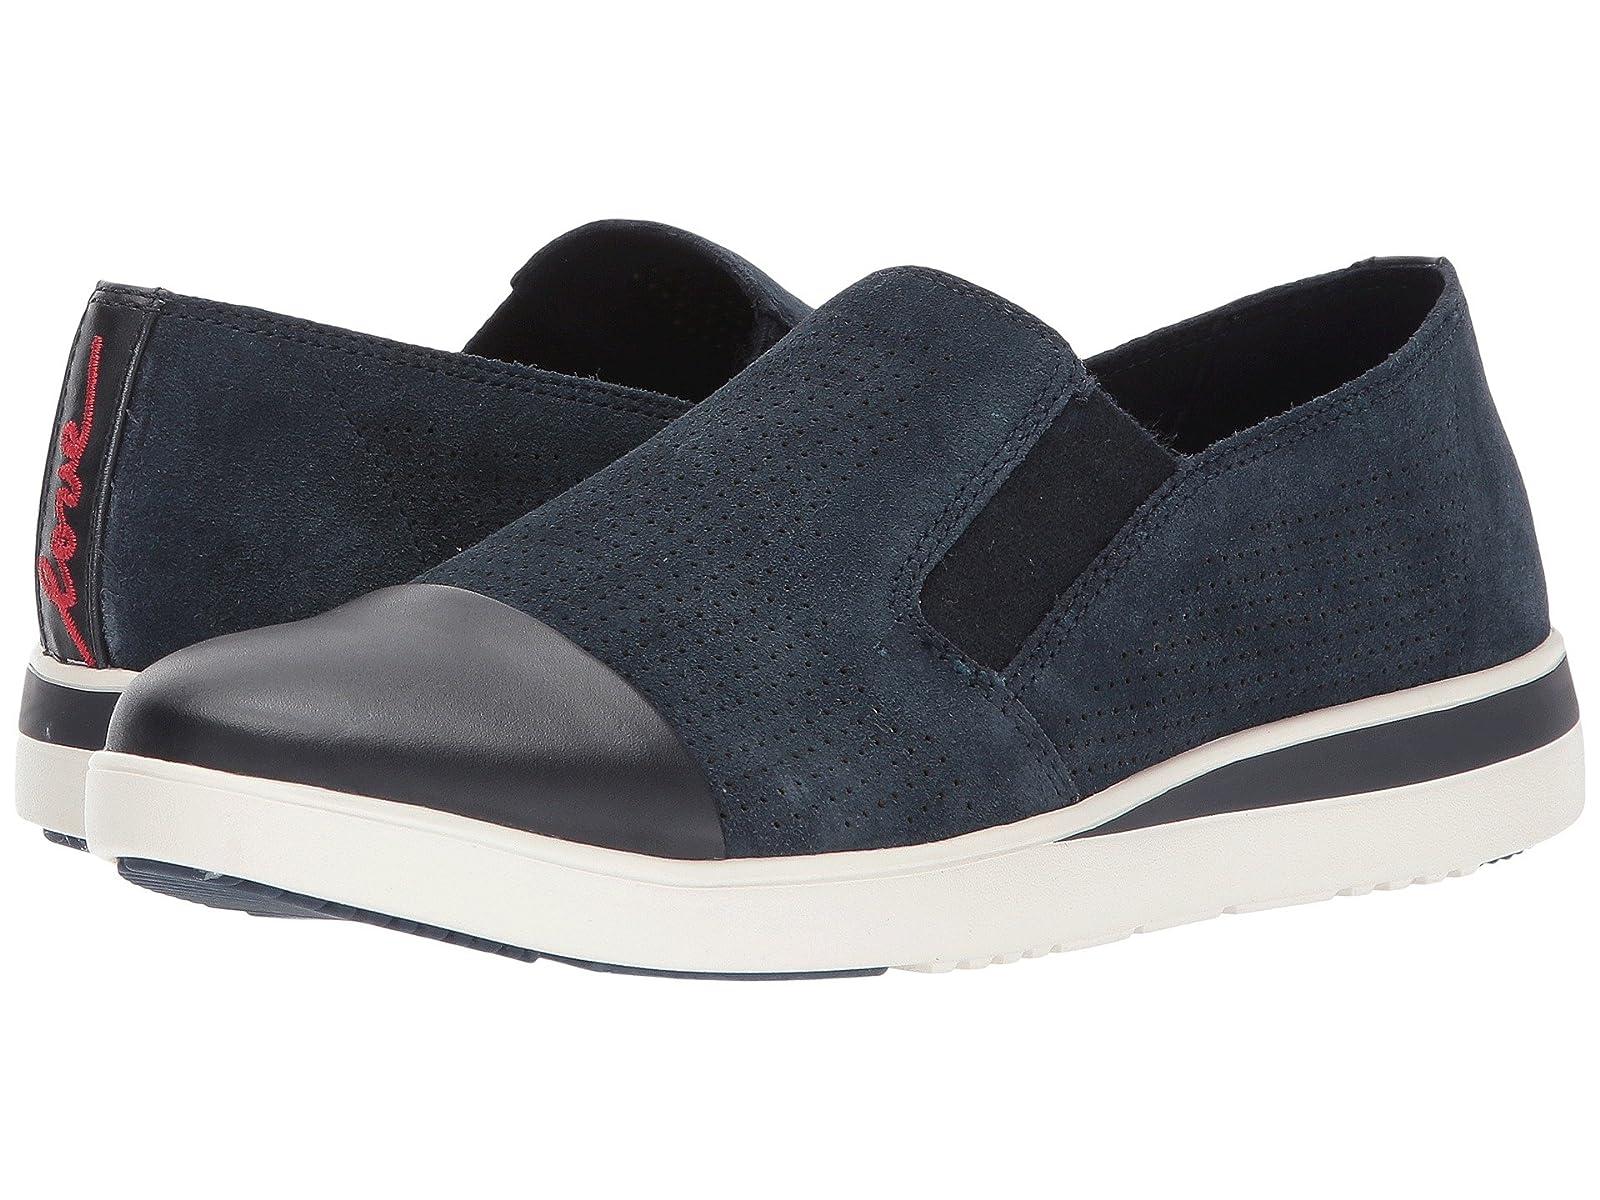 ED Ellen DeGeneres AvianaCheap and distinctive eye-catching shoes